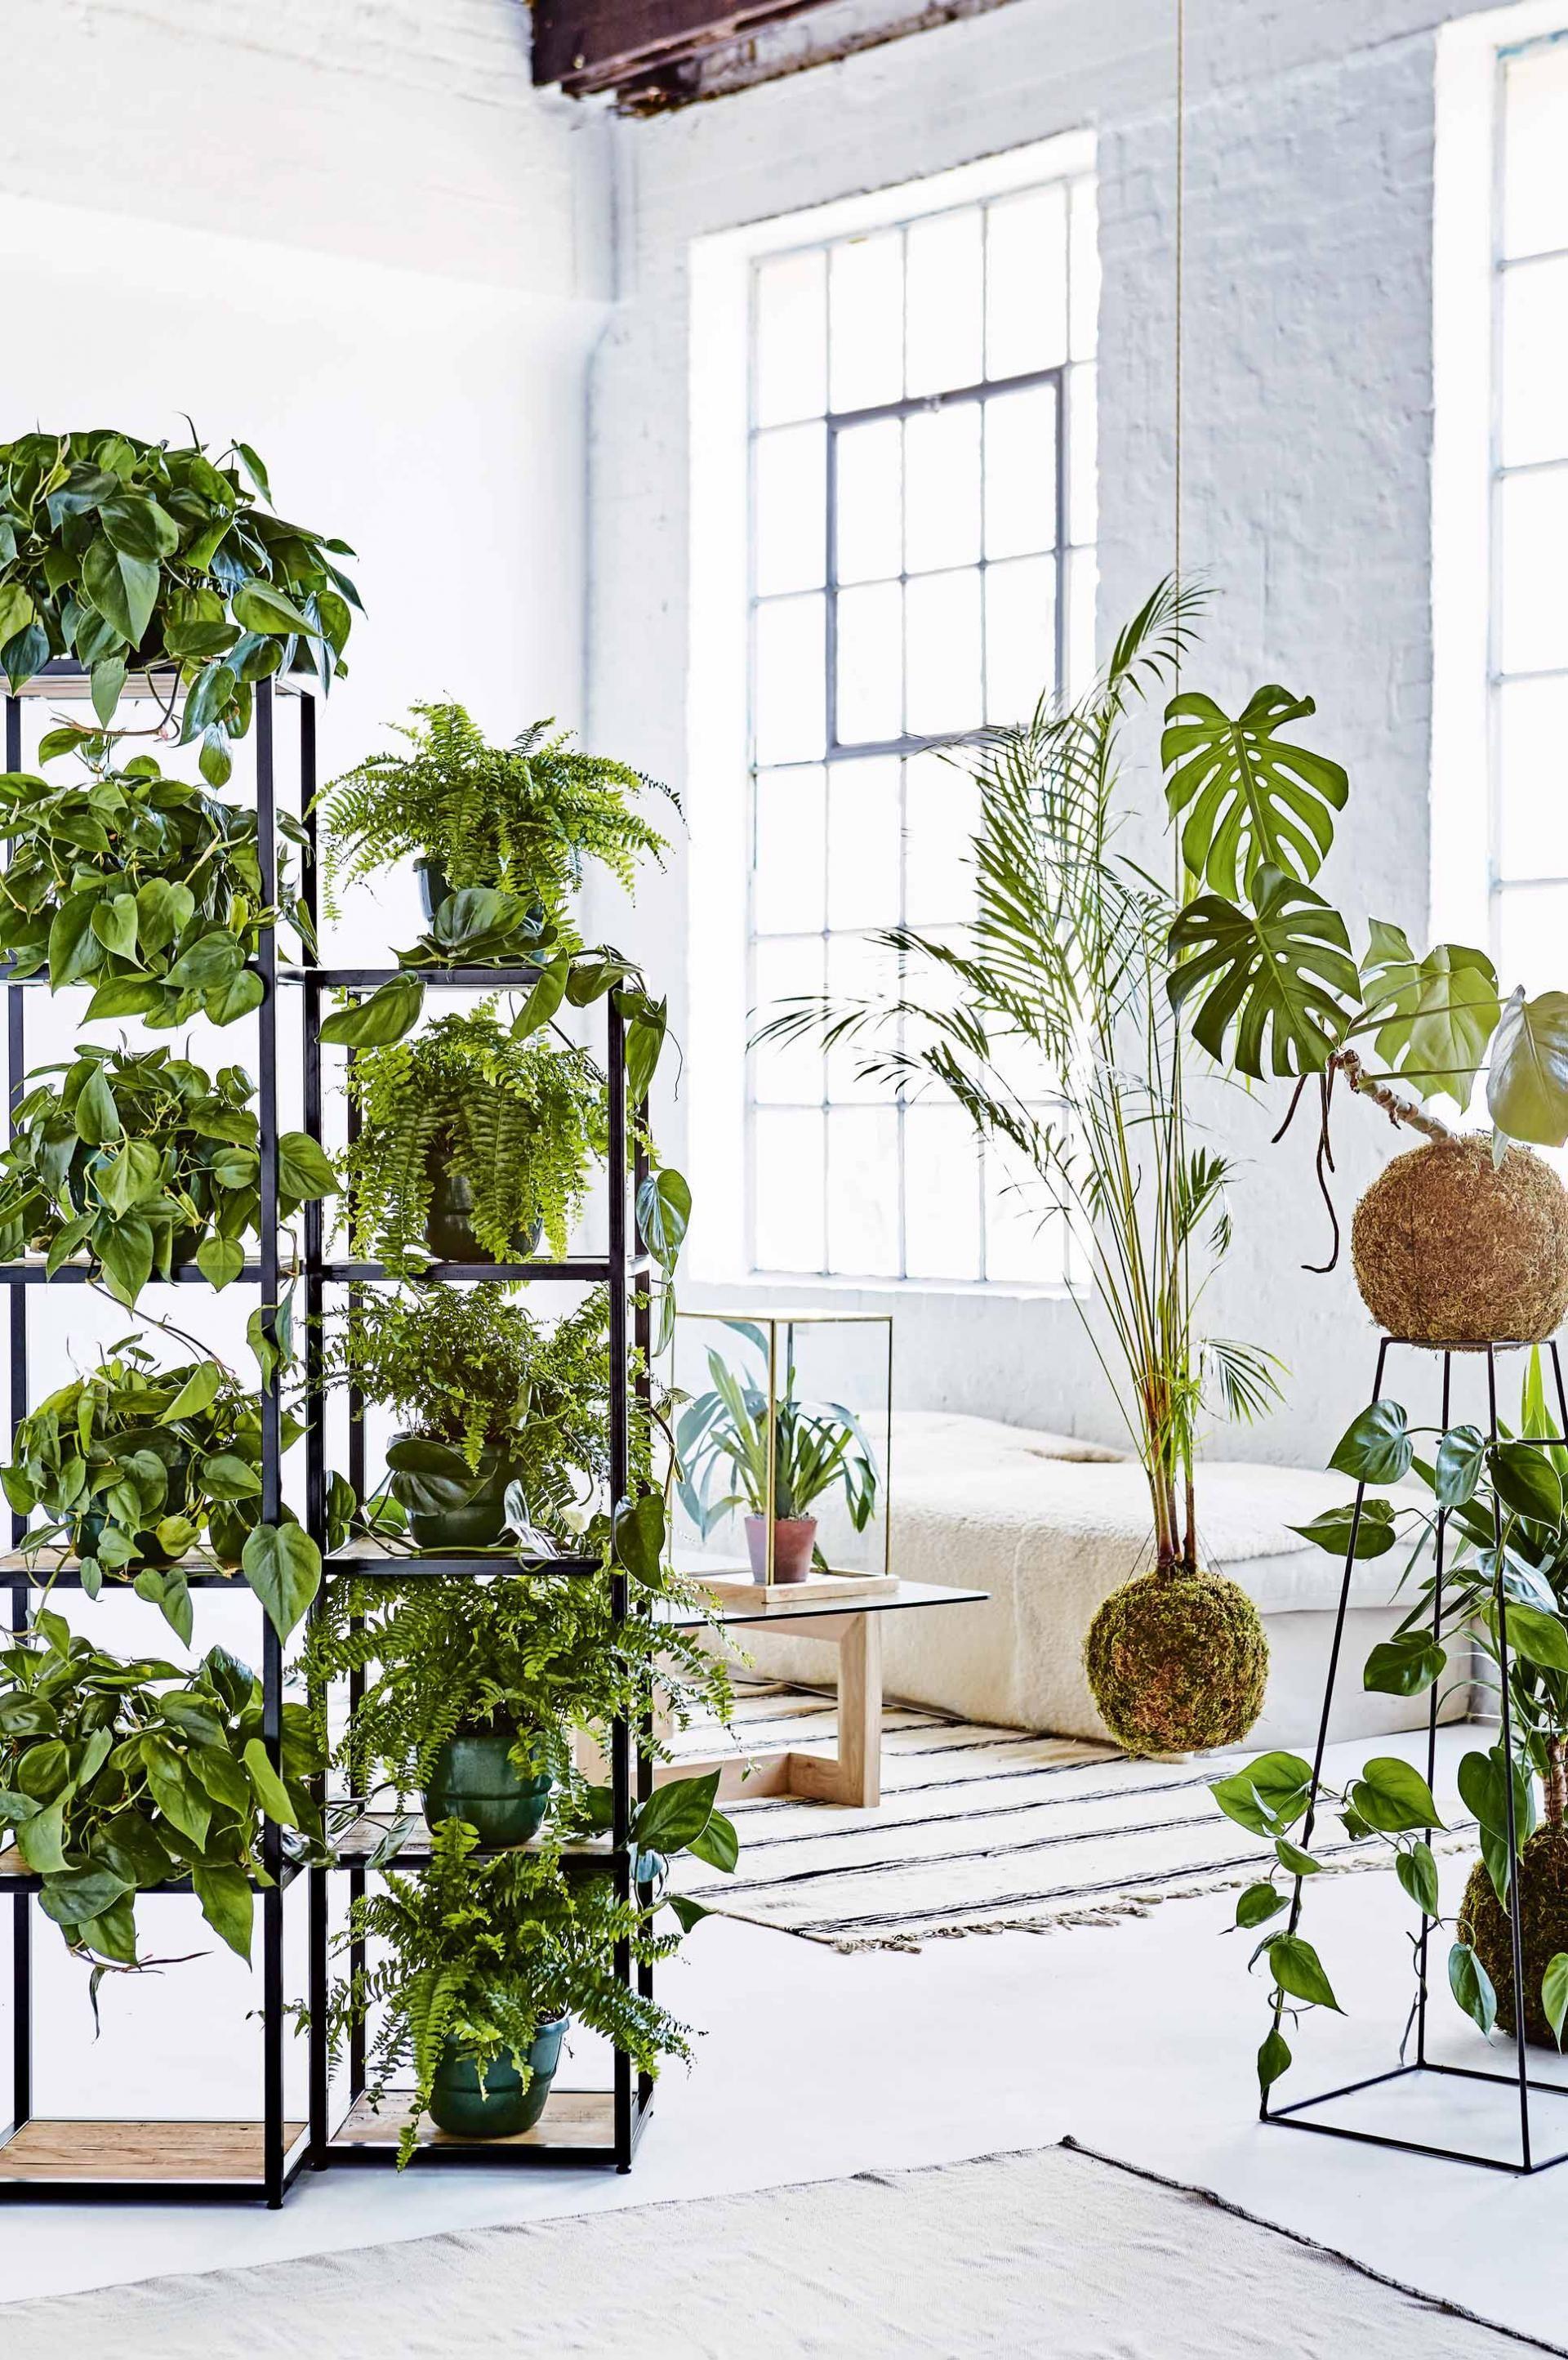 Planten stellage roomdividers pinterest bureaus plants and